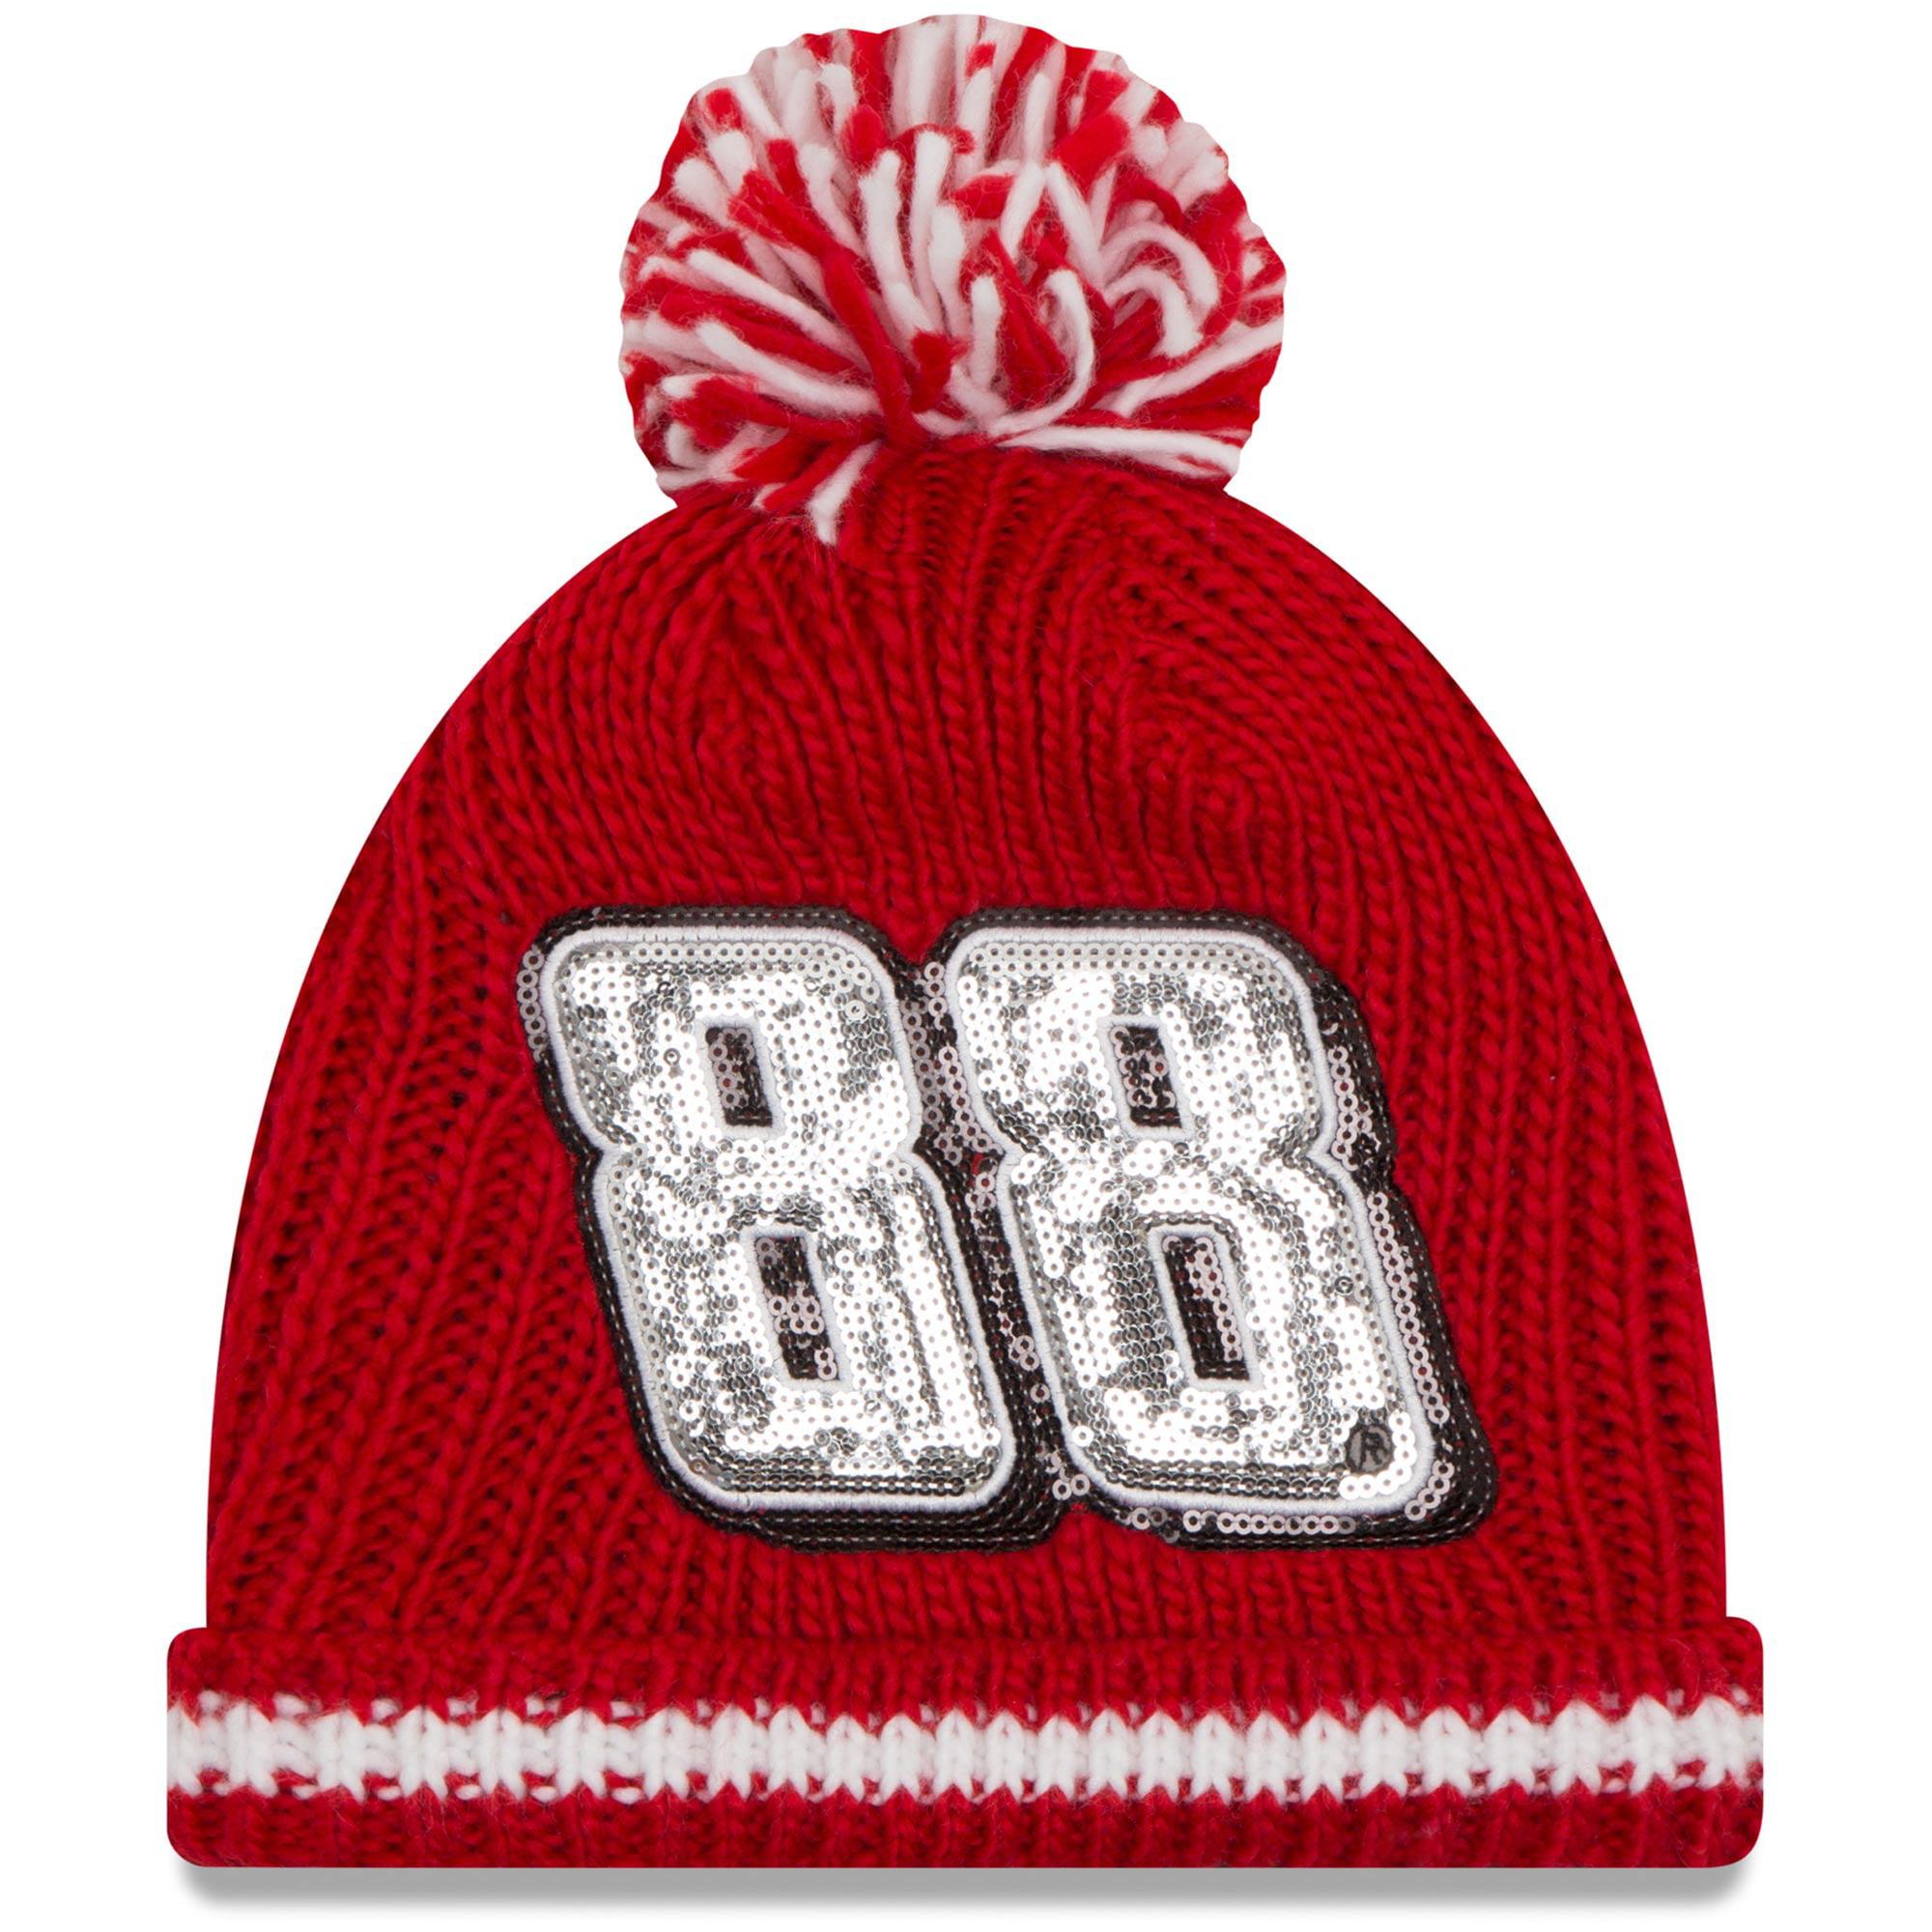 Dale Earnhardt Jr. New Era Women's Sequin Frost Cuffed Knit Hat with Pom - Red - OSFA